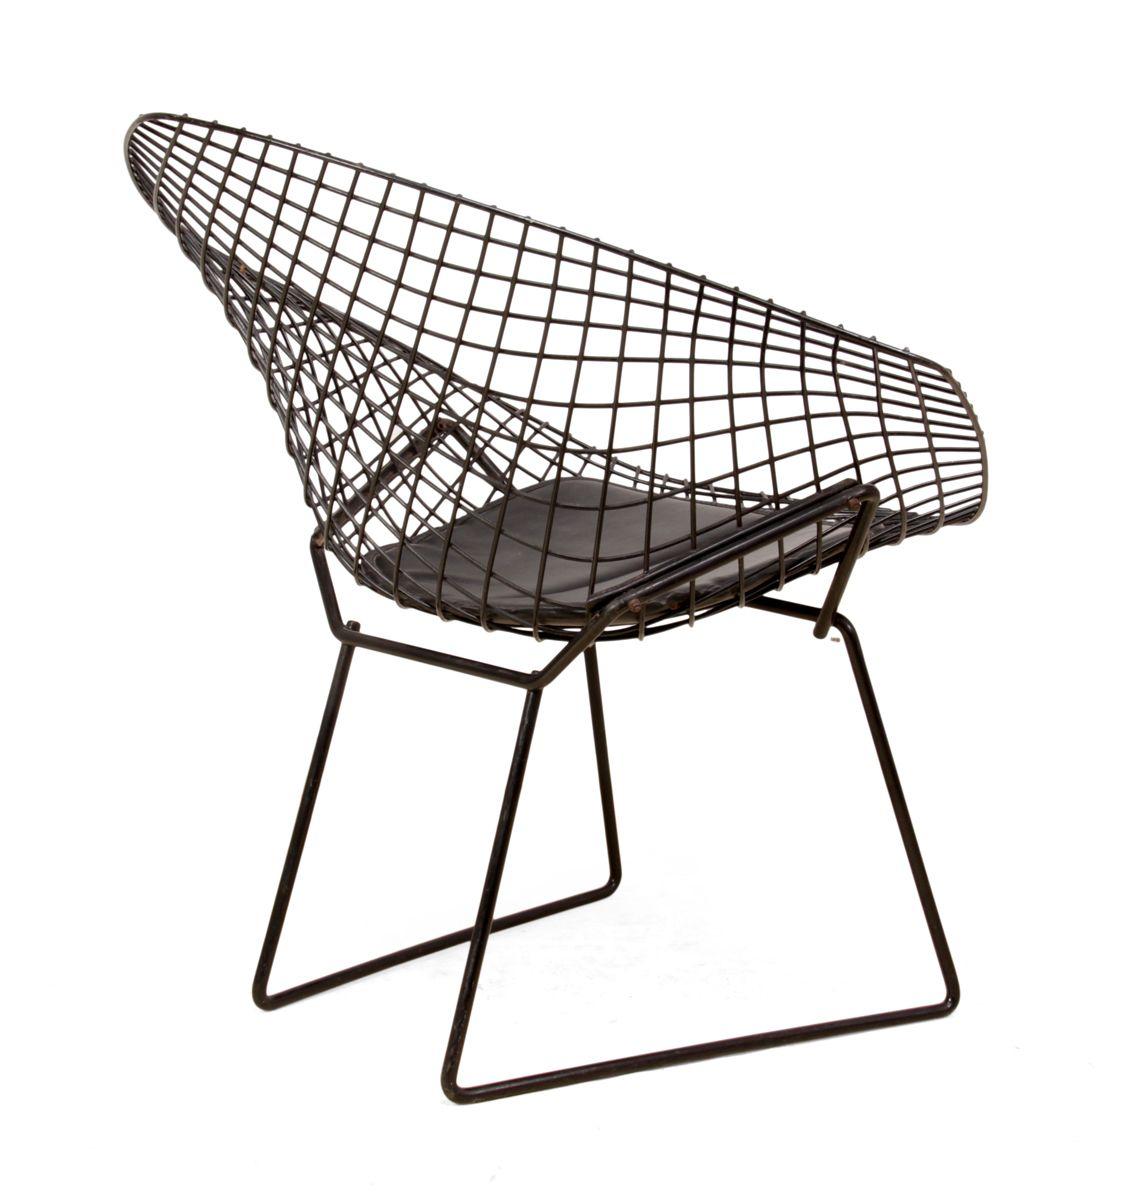 Chaise Harry Bertoia Bertoia Asymmetric Chaise Lounge